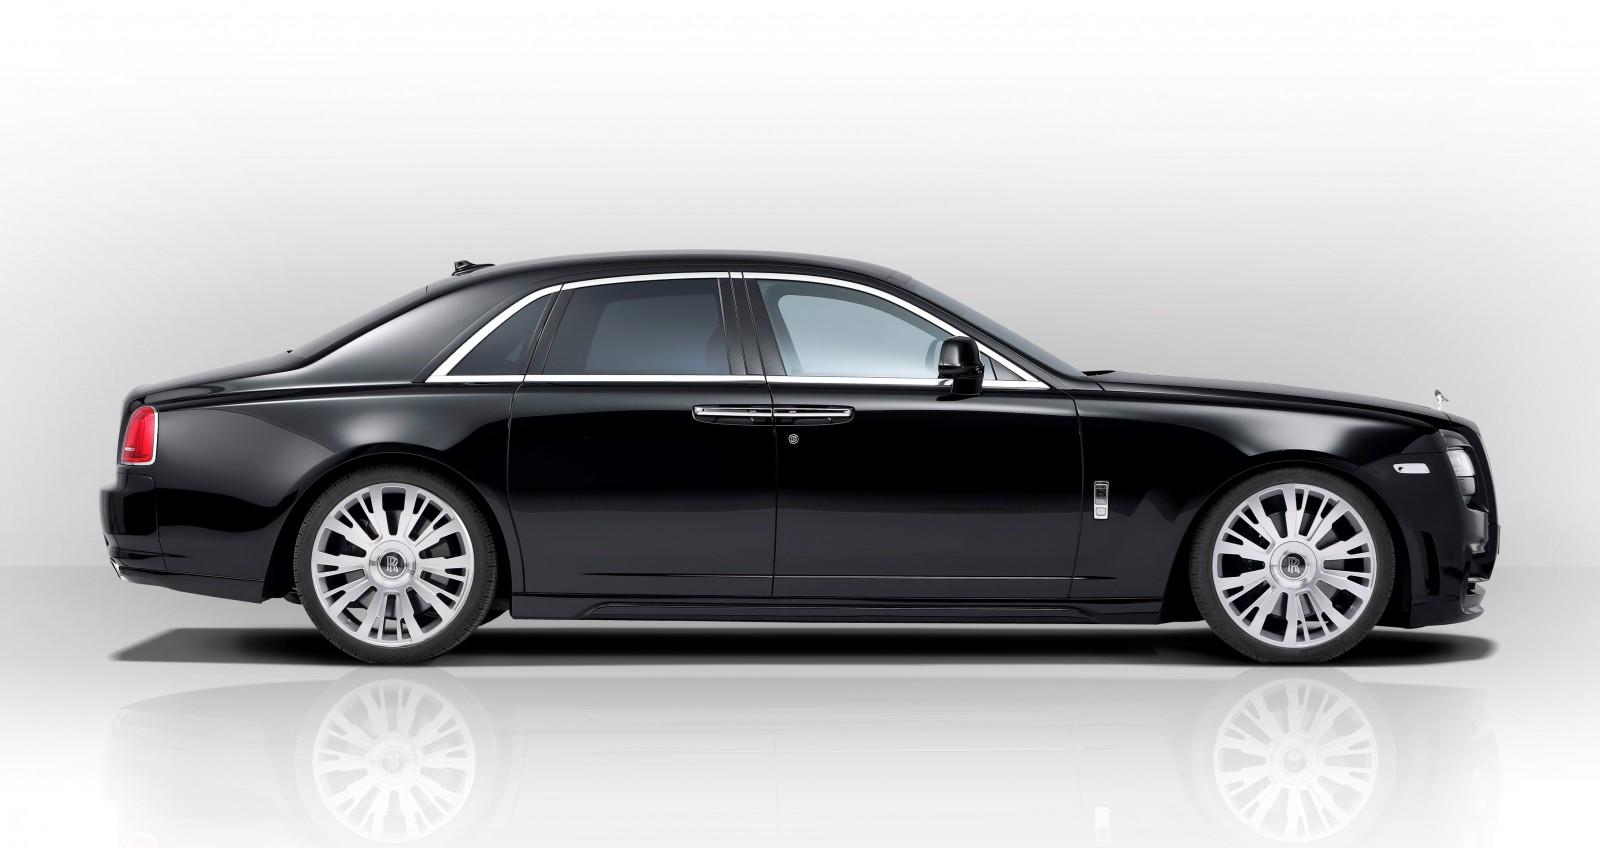 Novitec SPOFEC Rolls-Royce Ghost 10